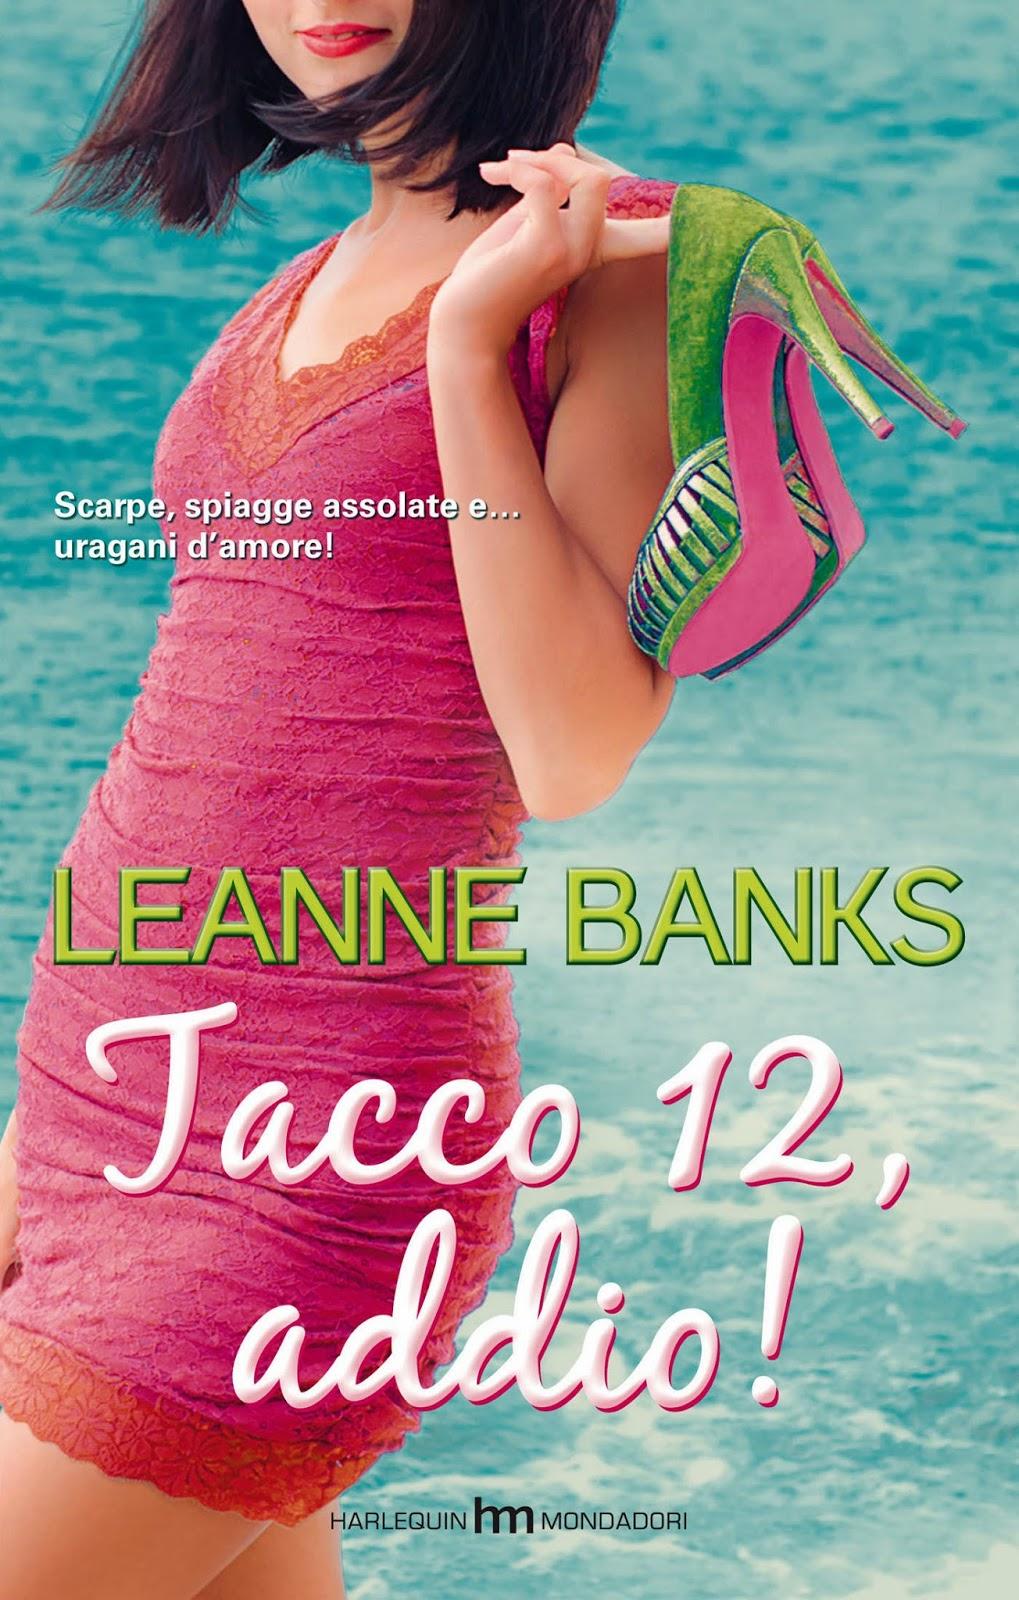 Leanne Banks - Tacco 12, addio! (2014)